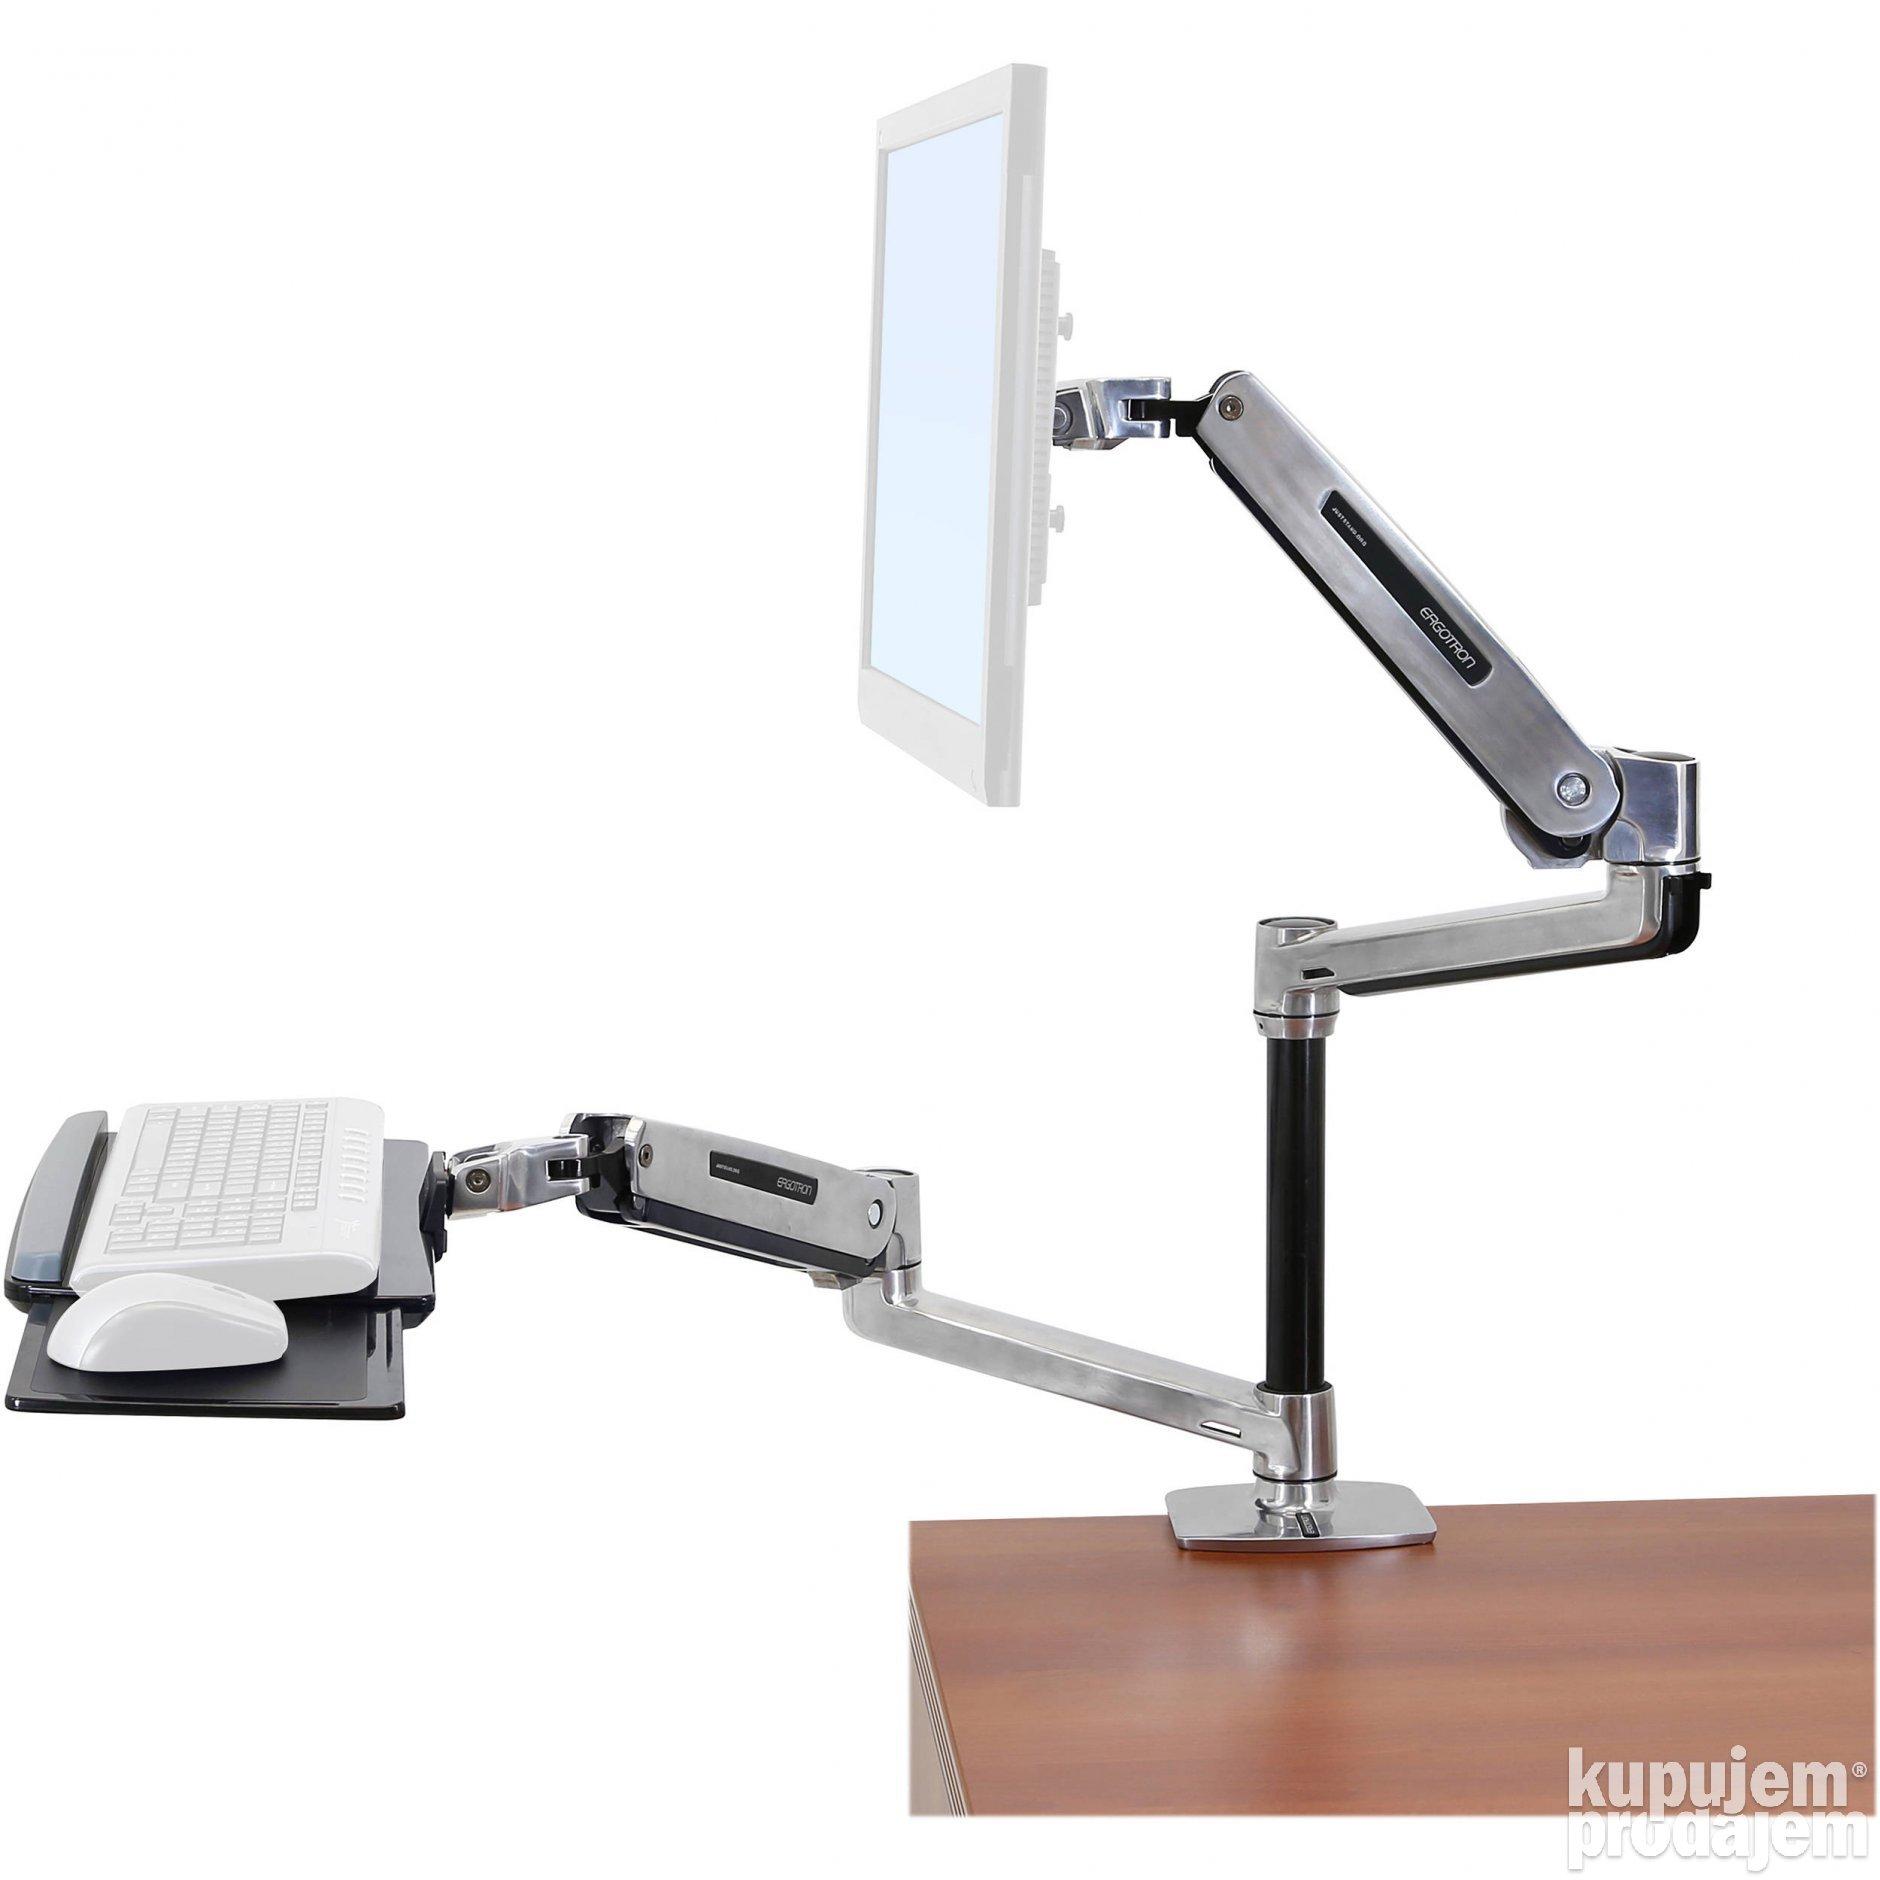 Kompjuteri   Desktop : ERGOTRON WorkFit-LX Sit-Stand Desk Mount System 21.10.2020 - ID 97262357 ...